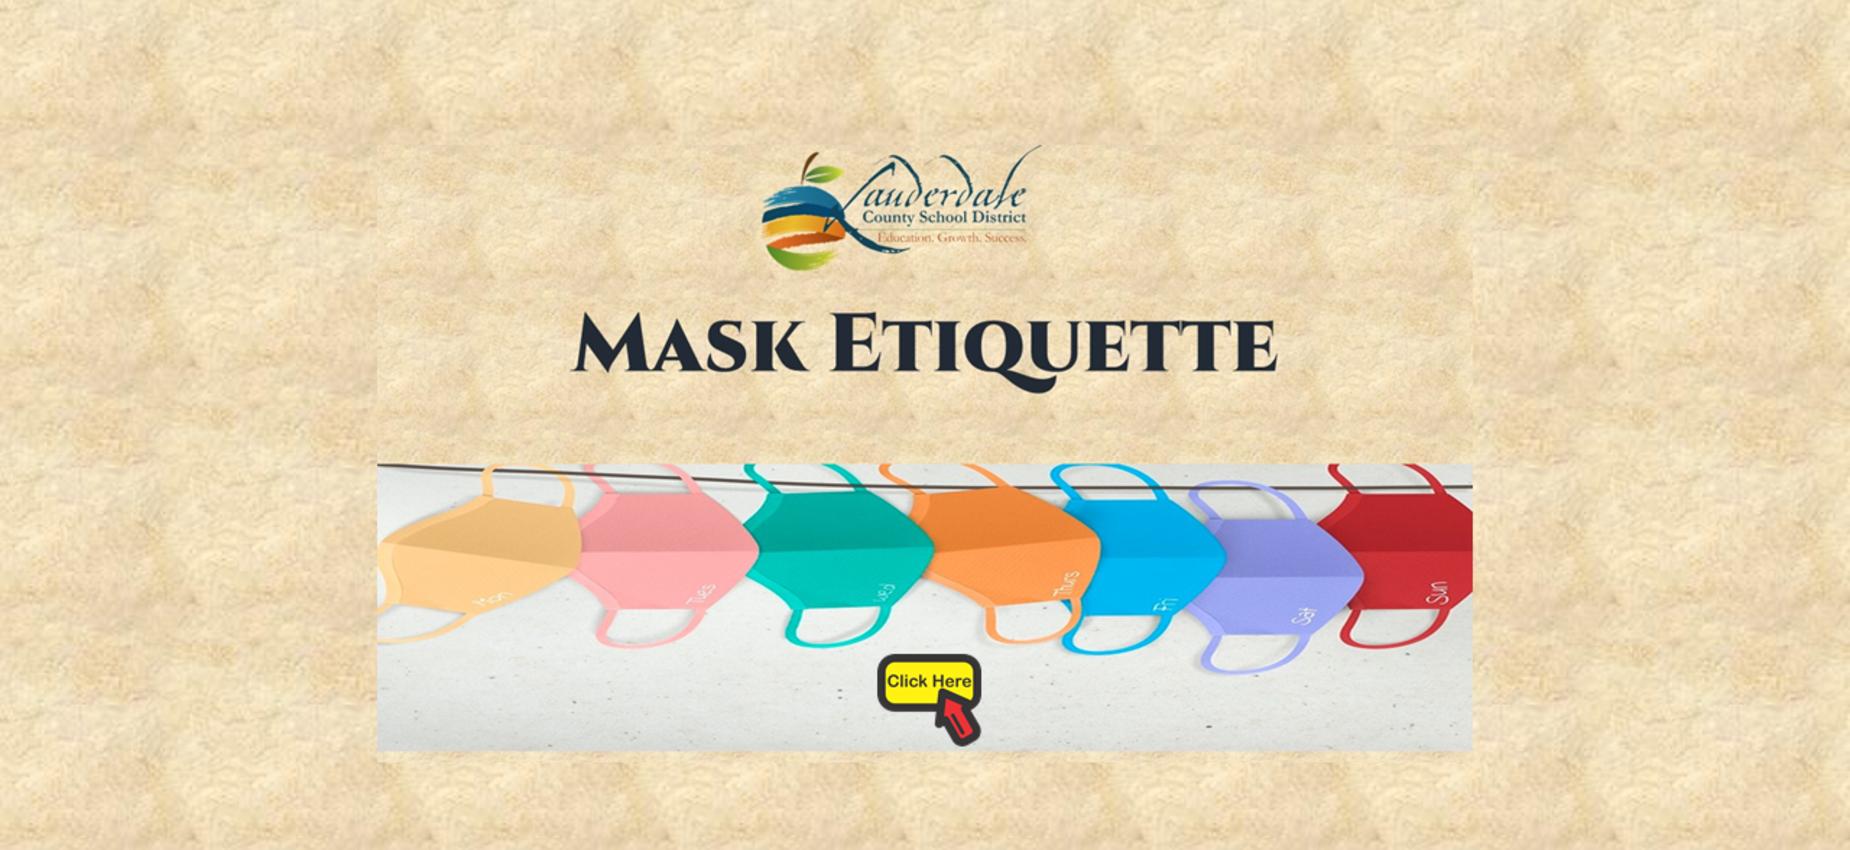 Mask Etiquette Graphic